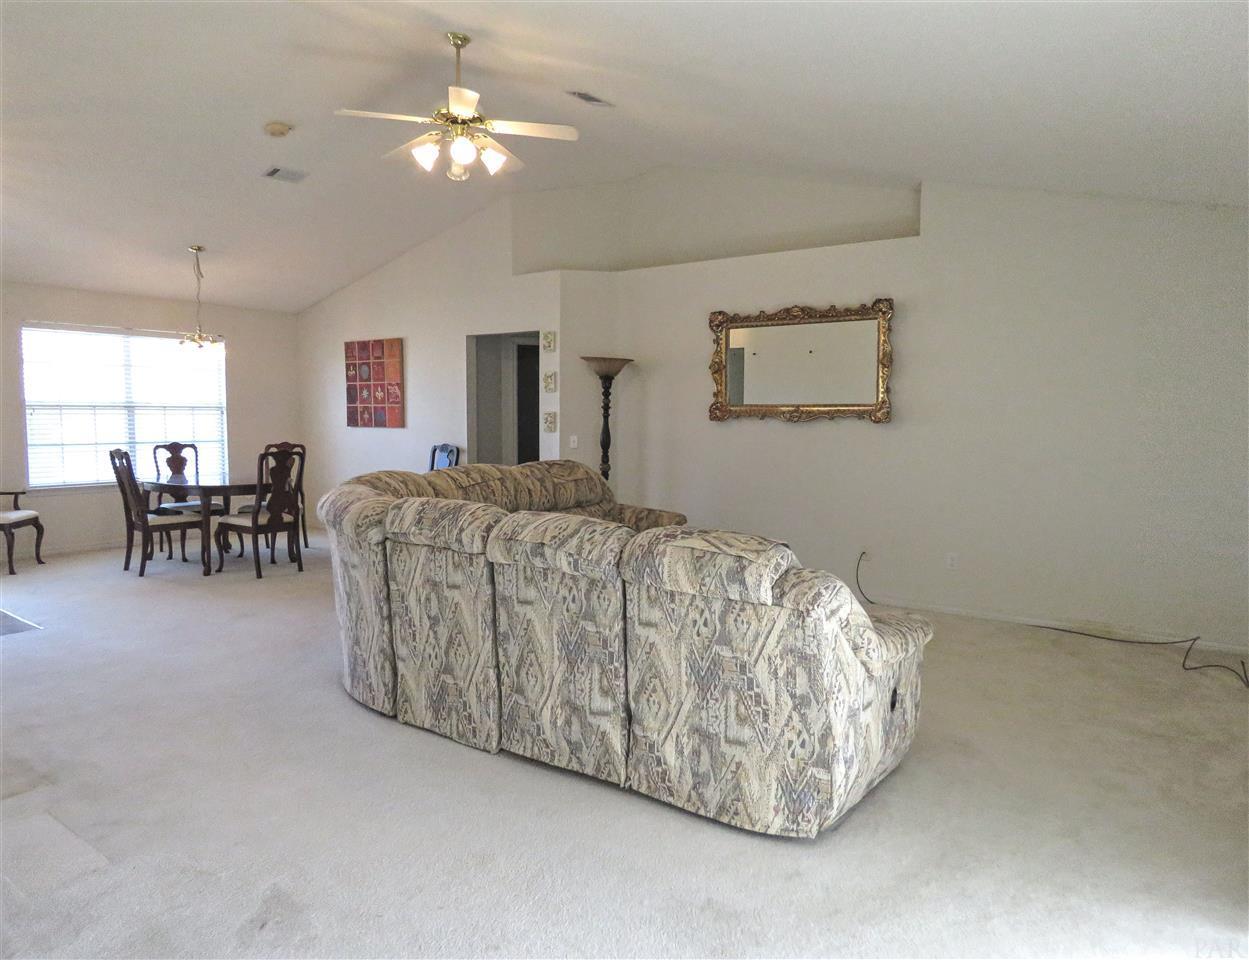 2125 Coral Creek Dr, Pensacola, FL 32506